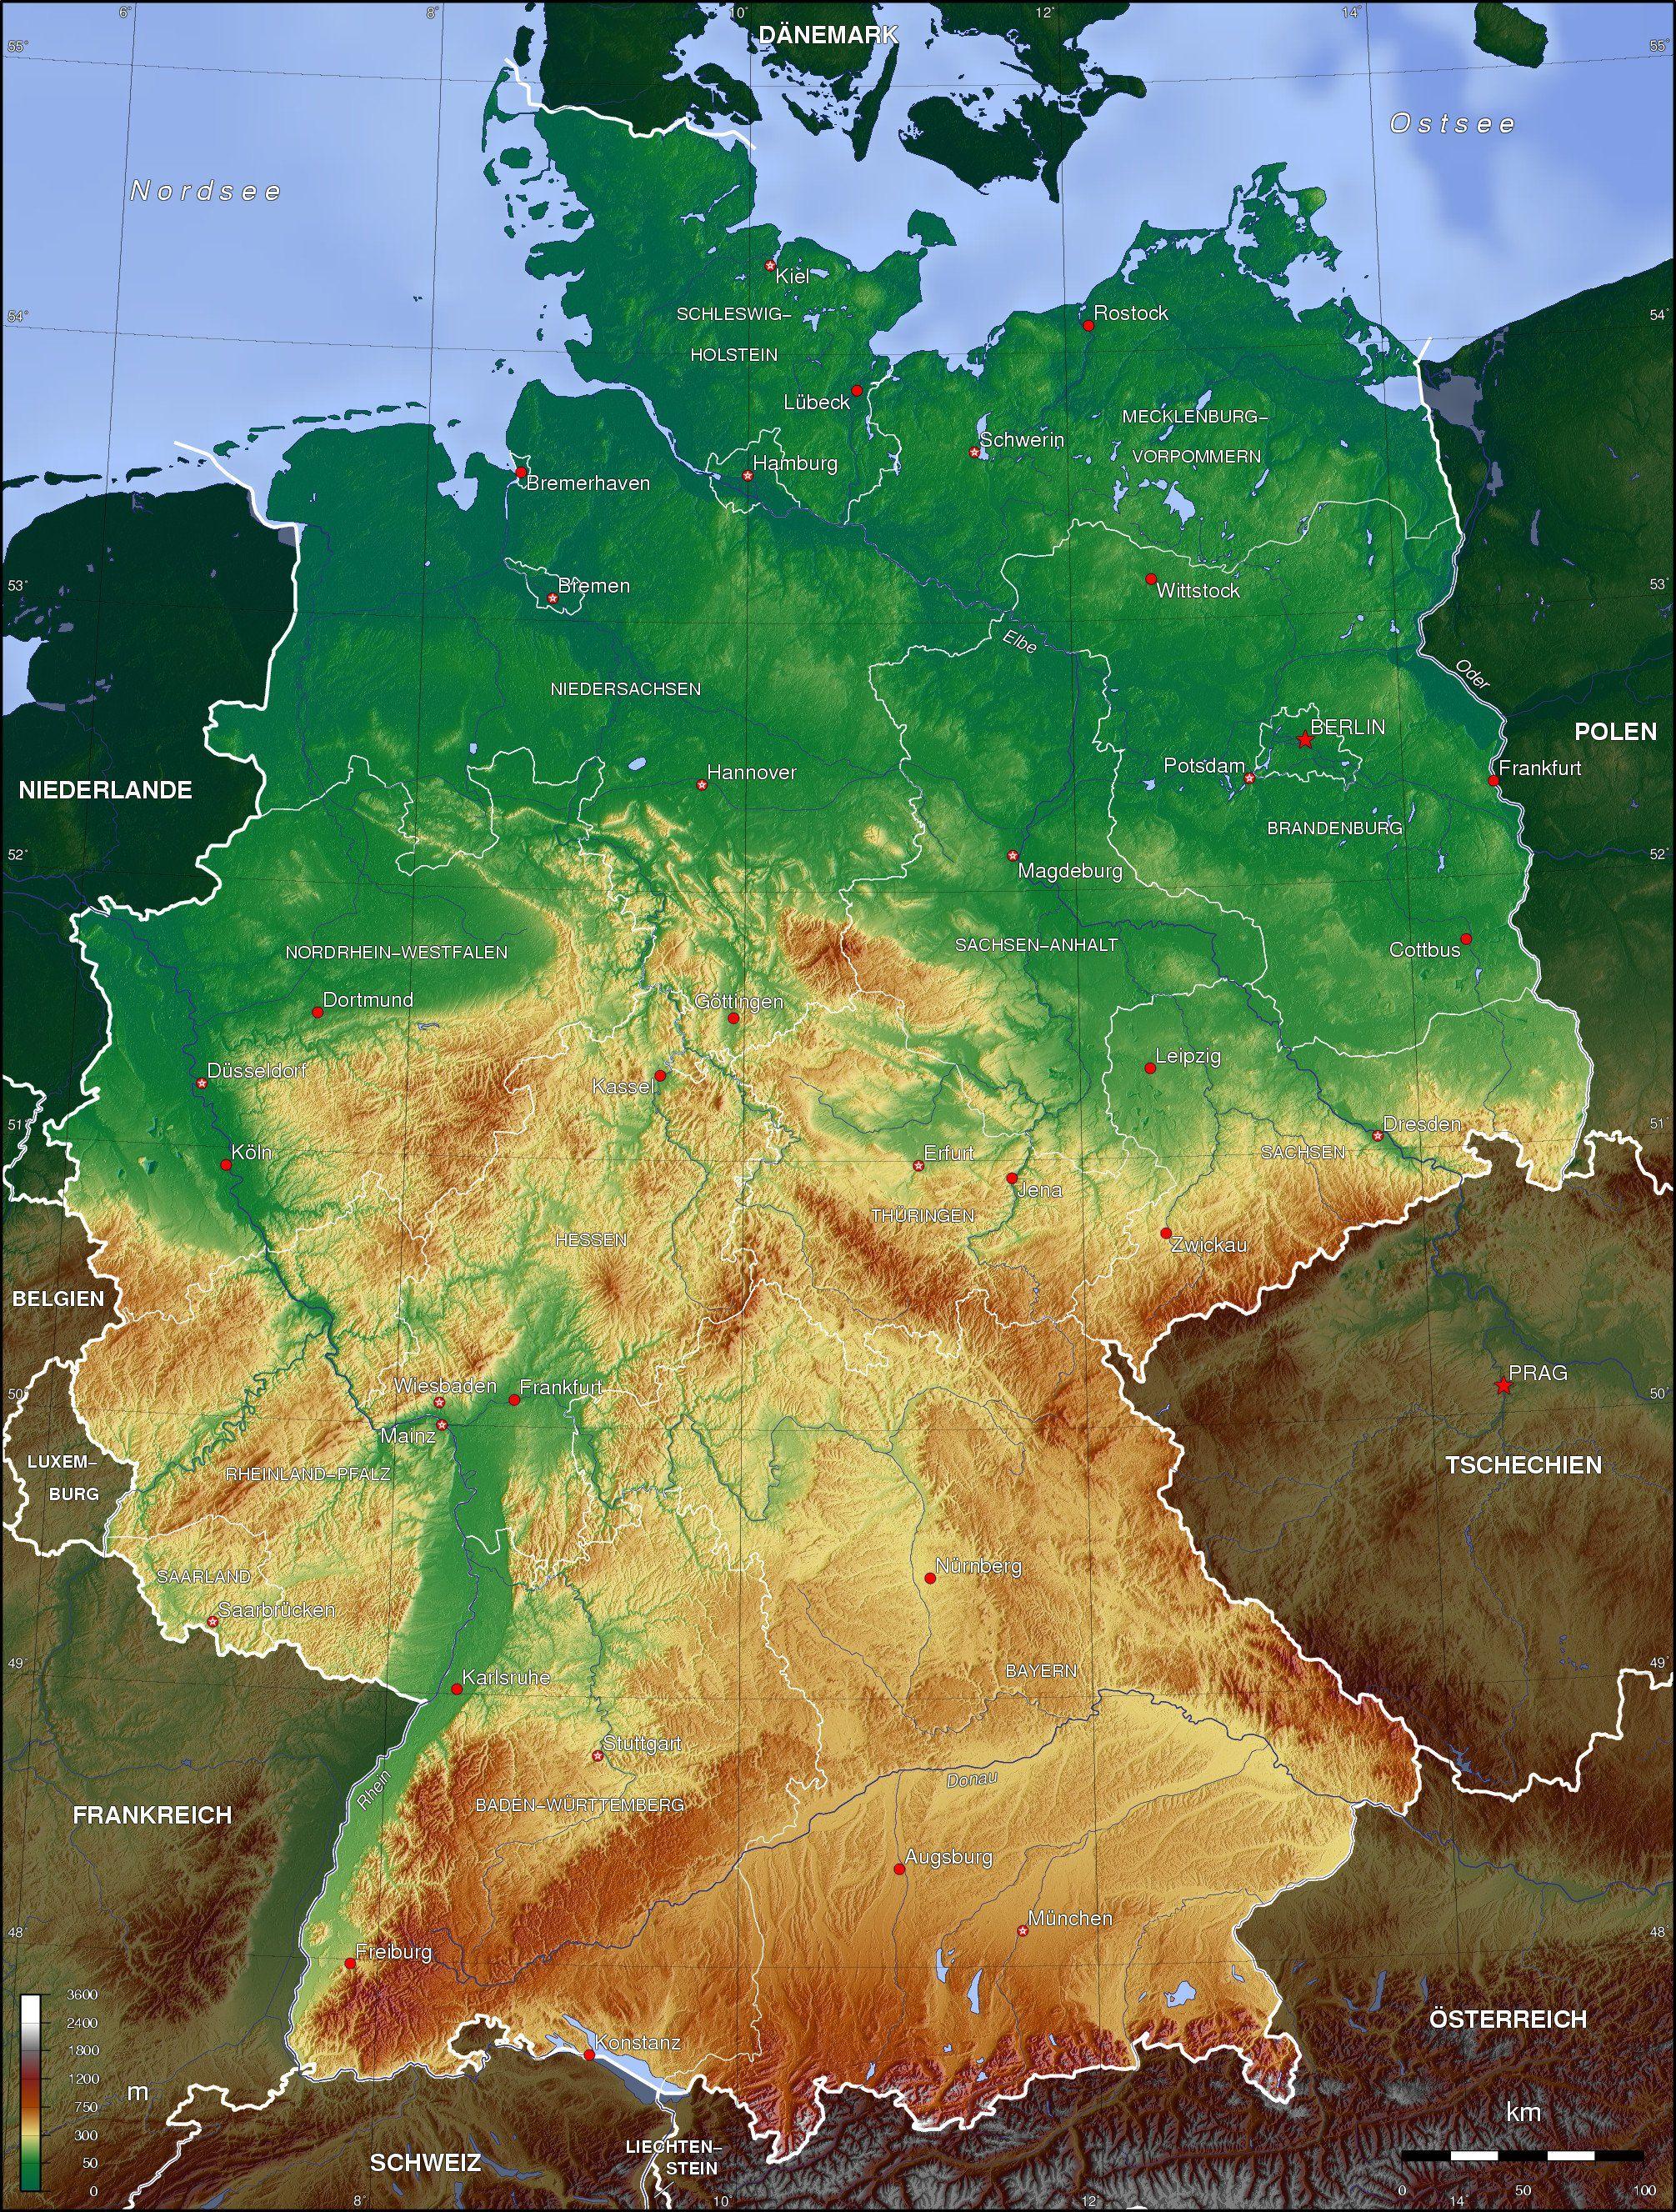 Topographic map, Germany weltkarte.com #map #germany #deutschland ...